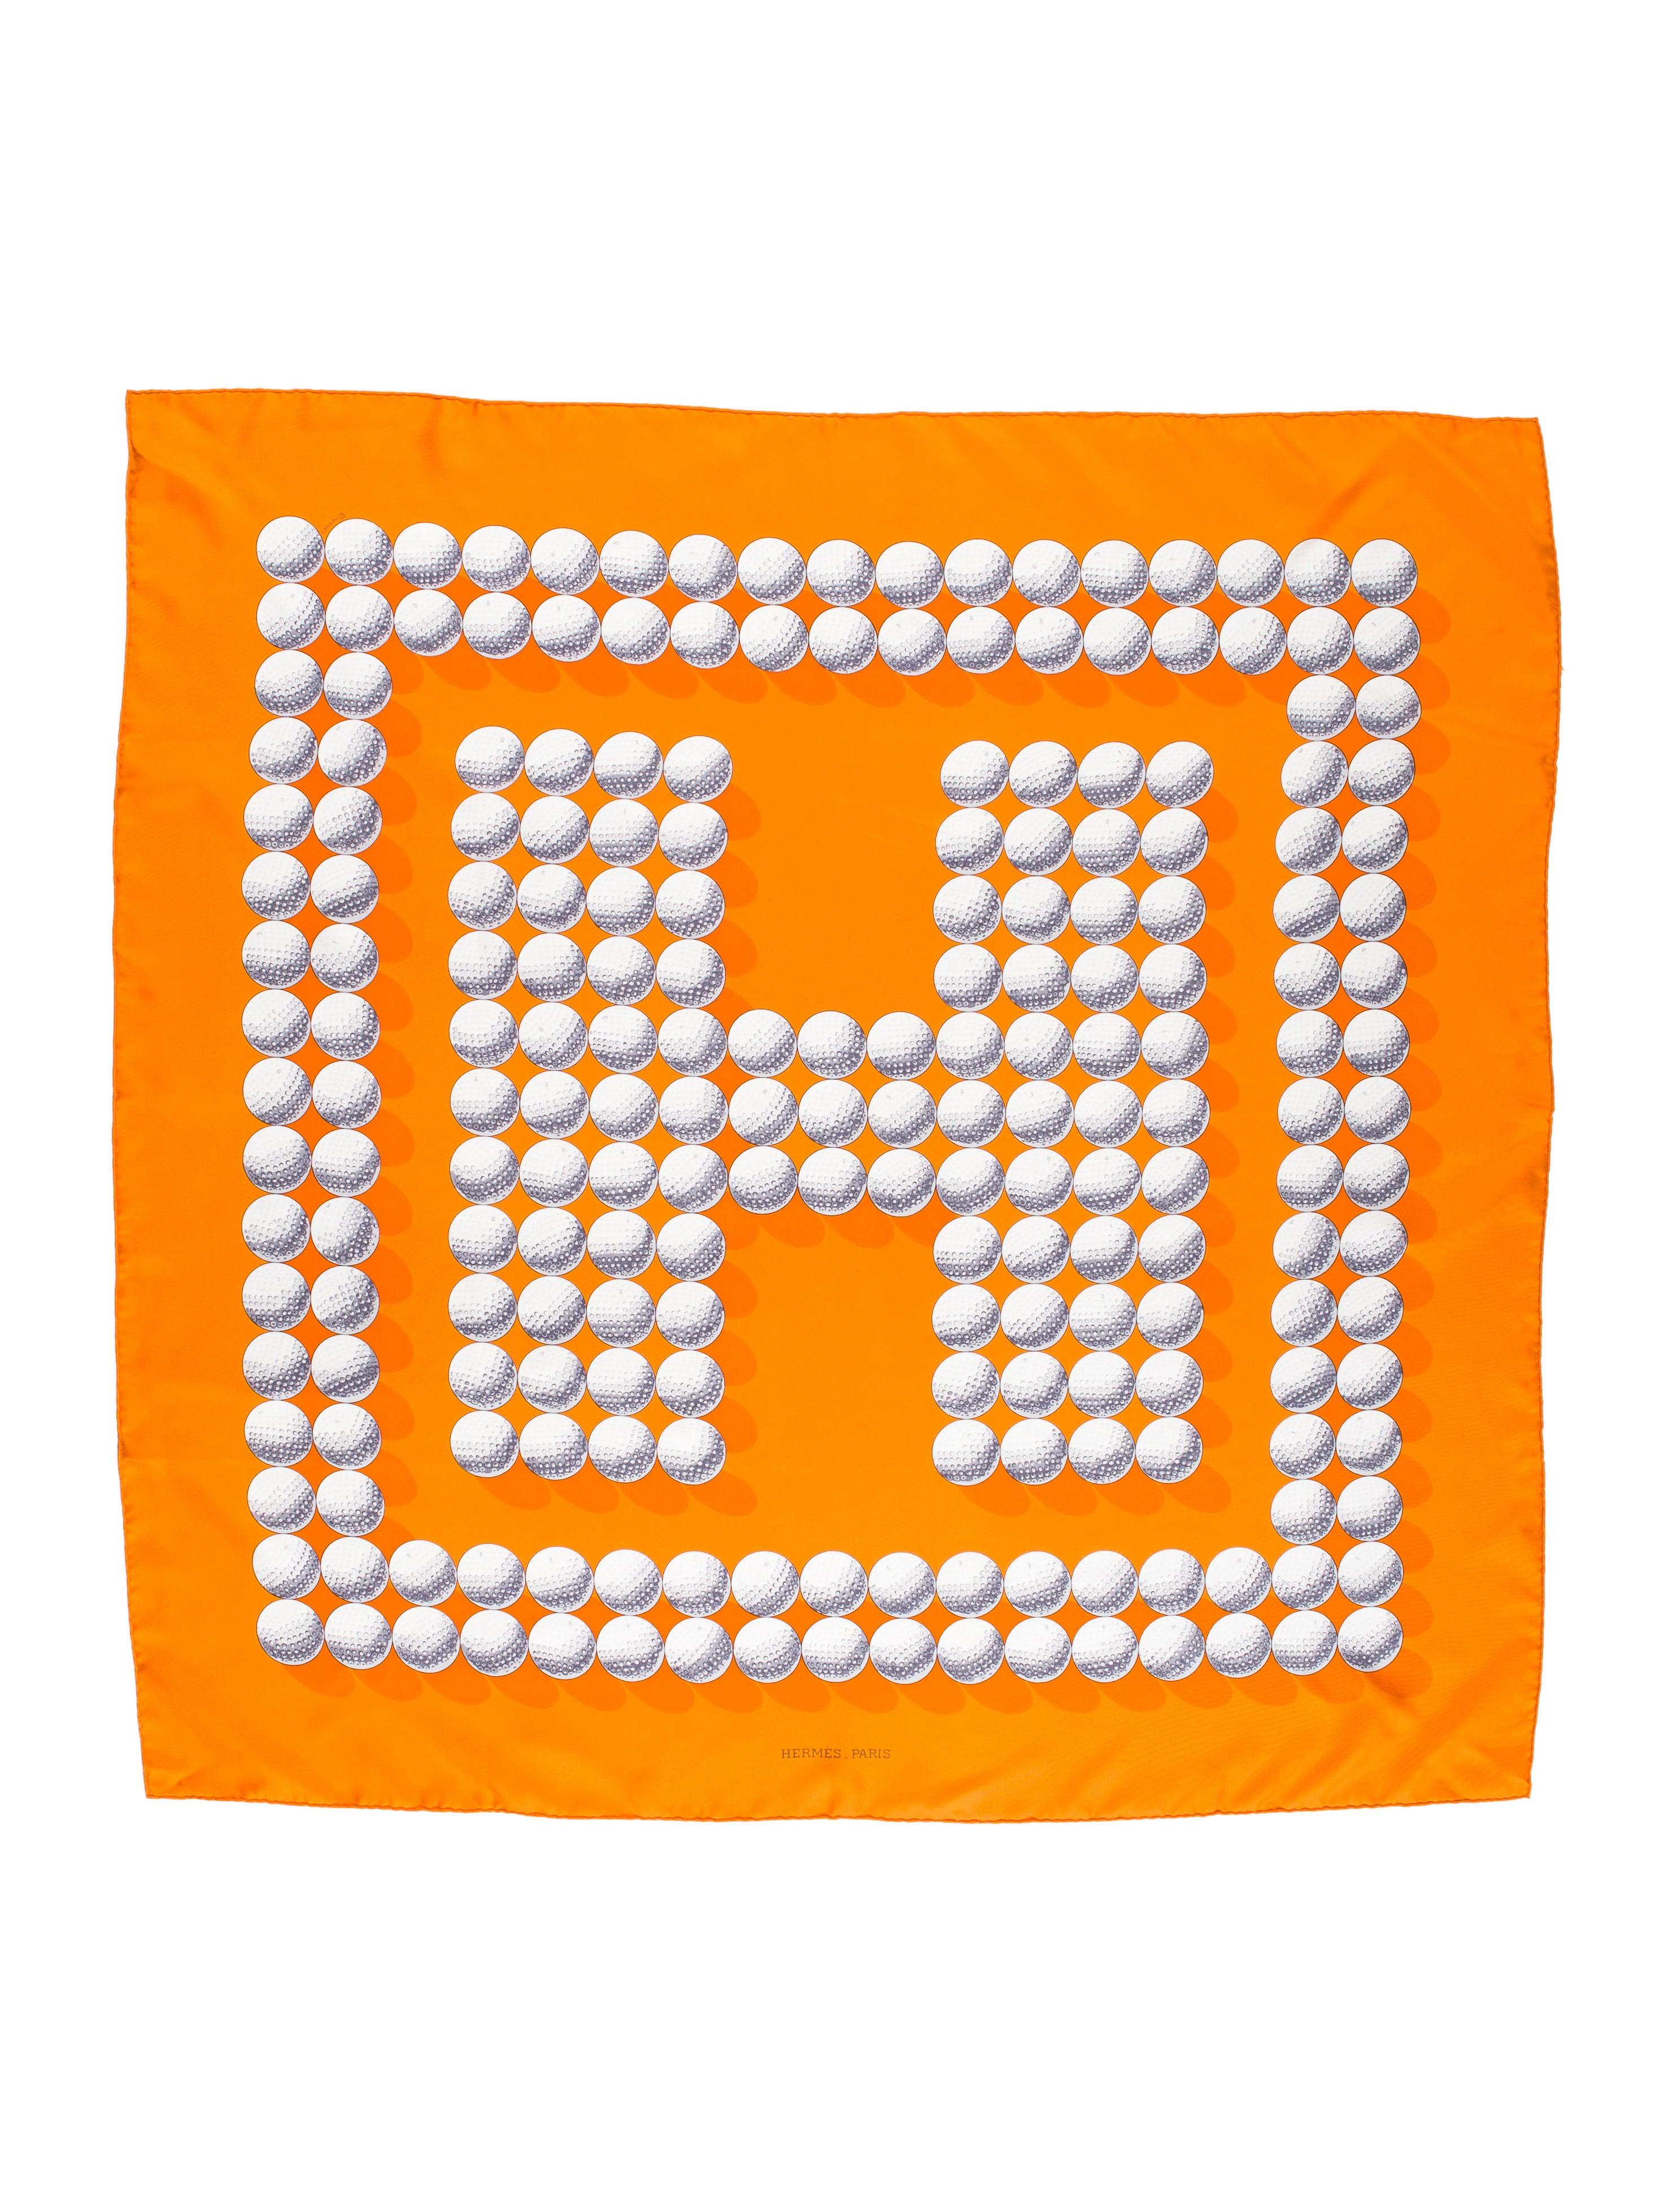 herm s balles de golf ii silk scarf accessories. Black Bedroom Furniture Sets. Home Design Ideas